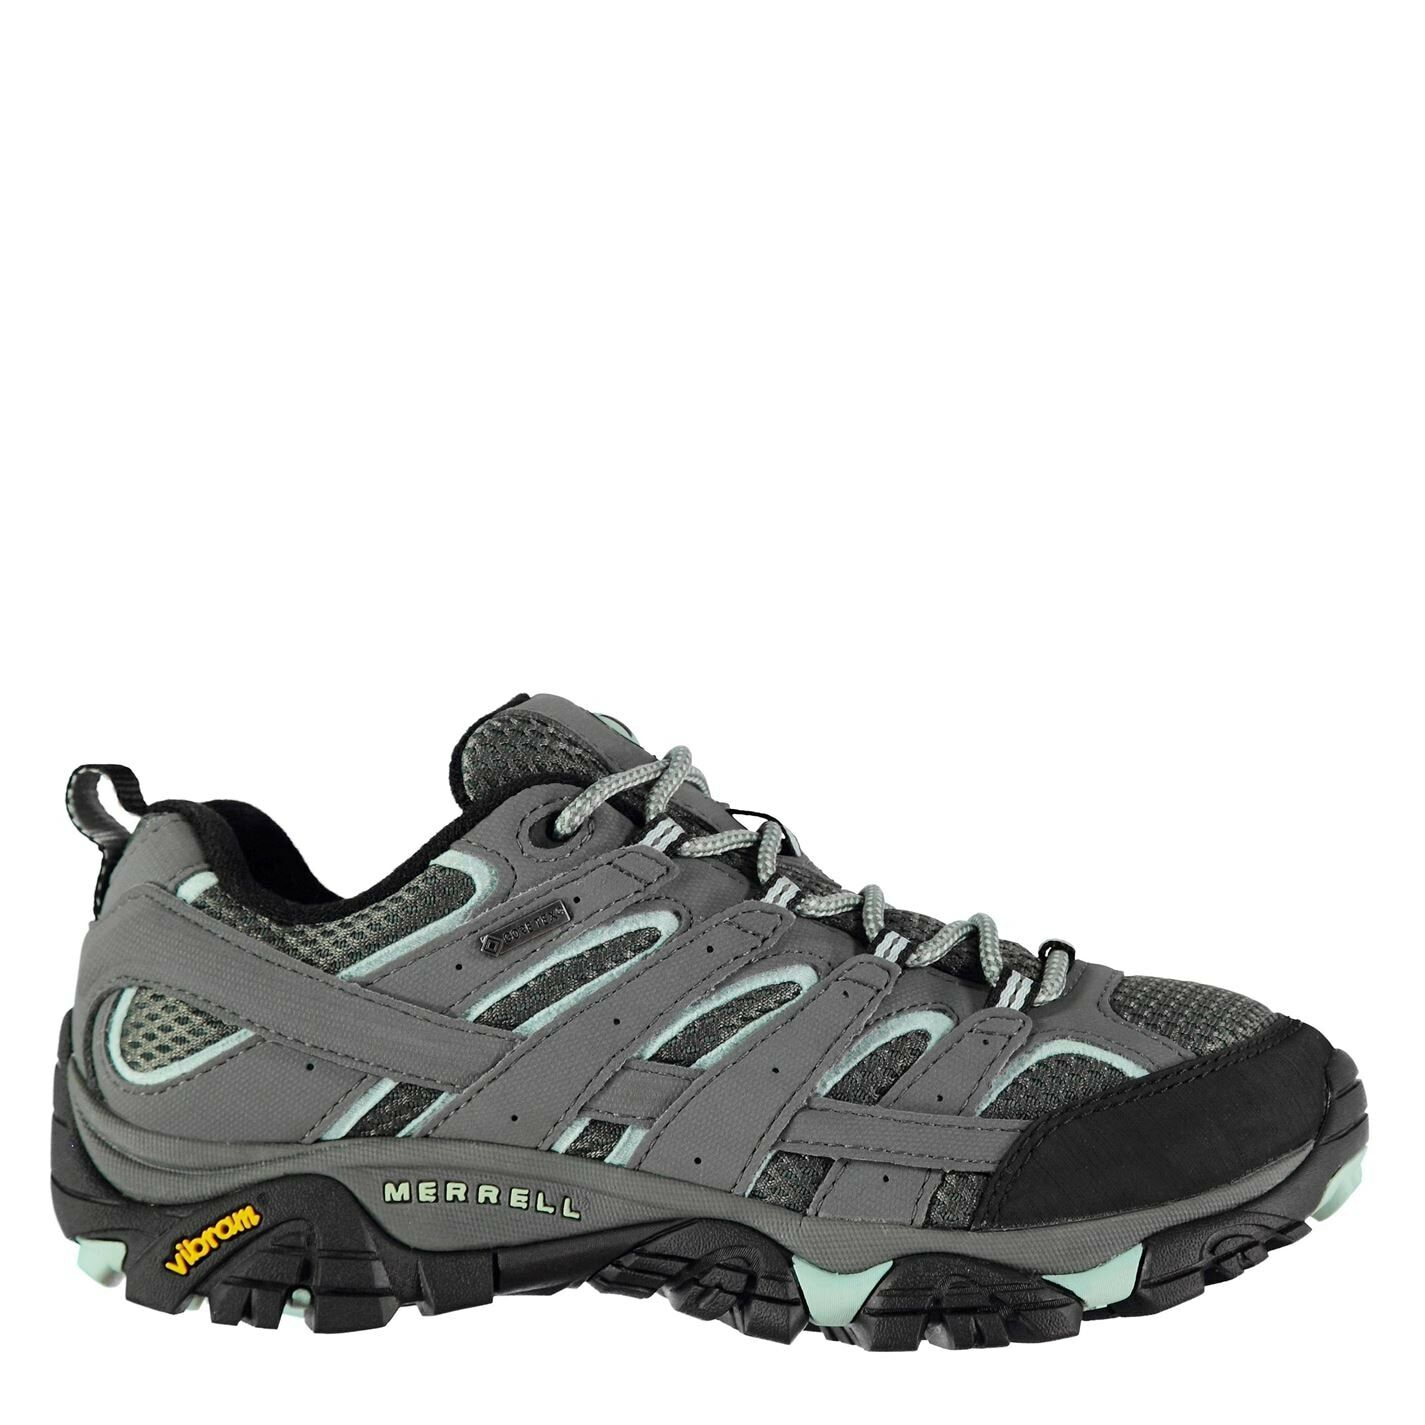 Merrell Moab 2 GTX Ladies Walking Shoes (187104-18710490) - Sports ... dc39fcb449a30